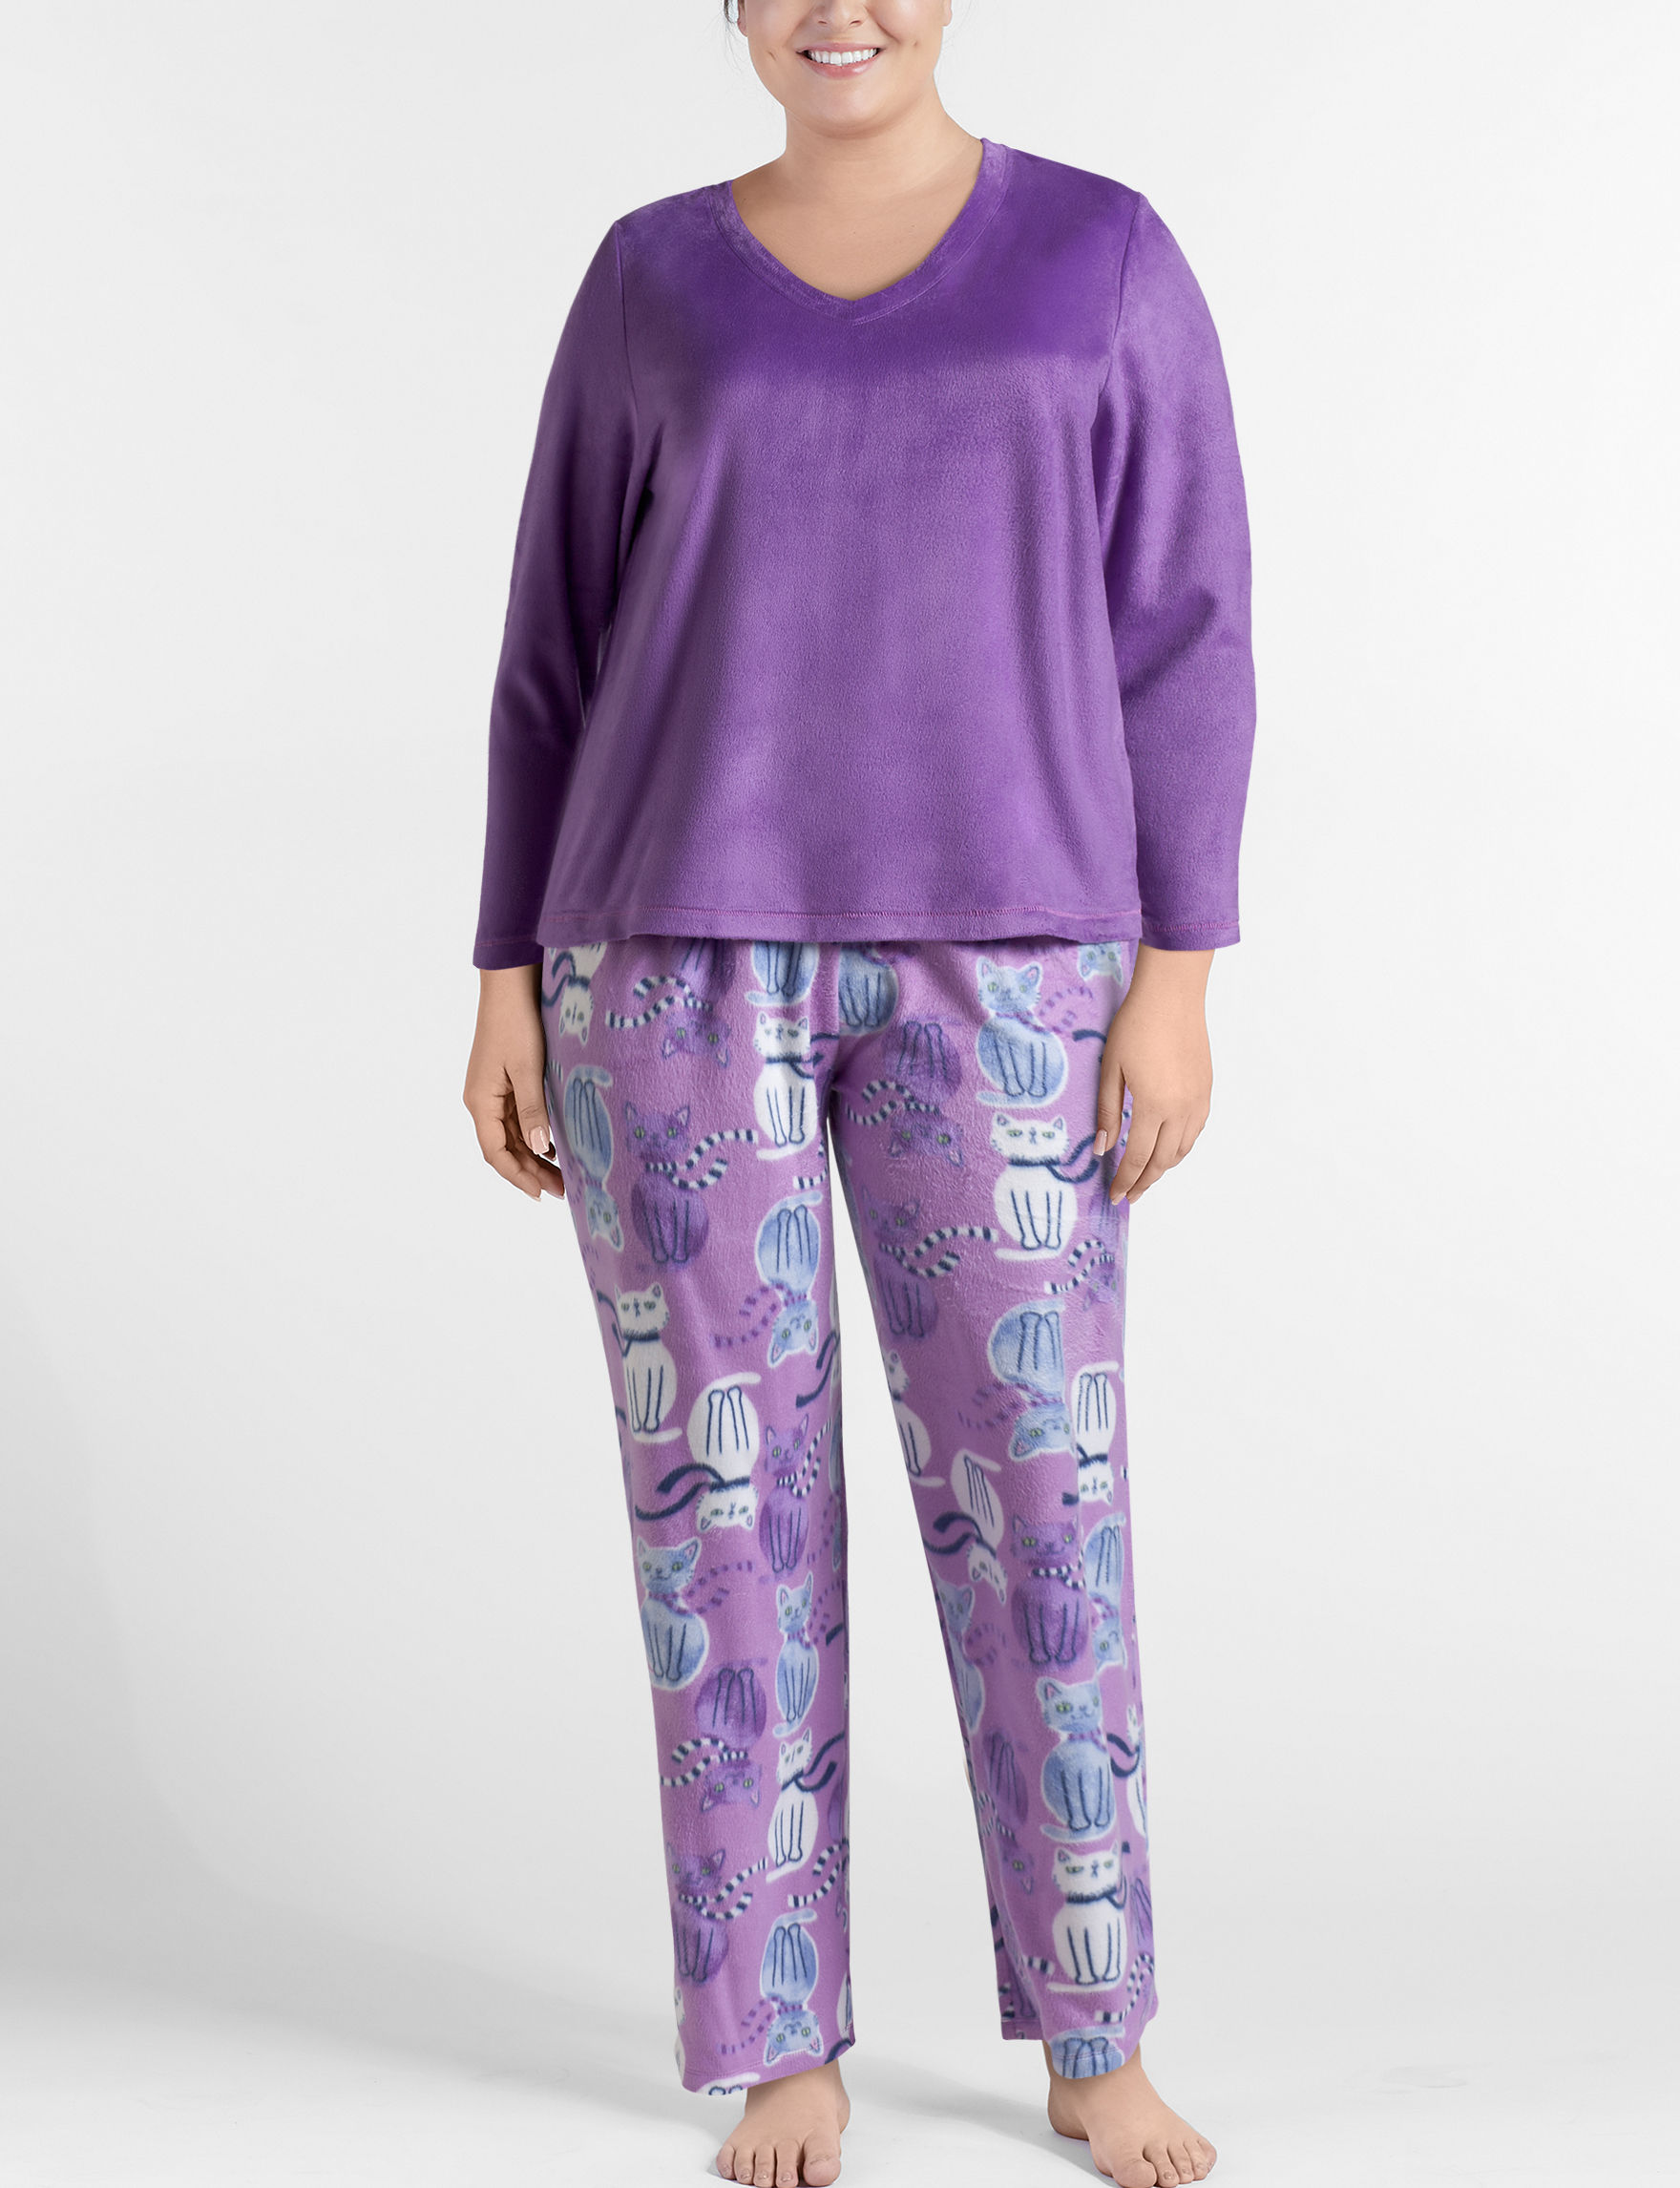 Hue Purple Pajama Sets